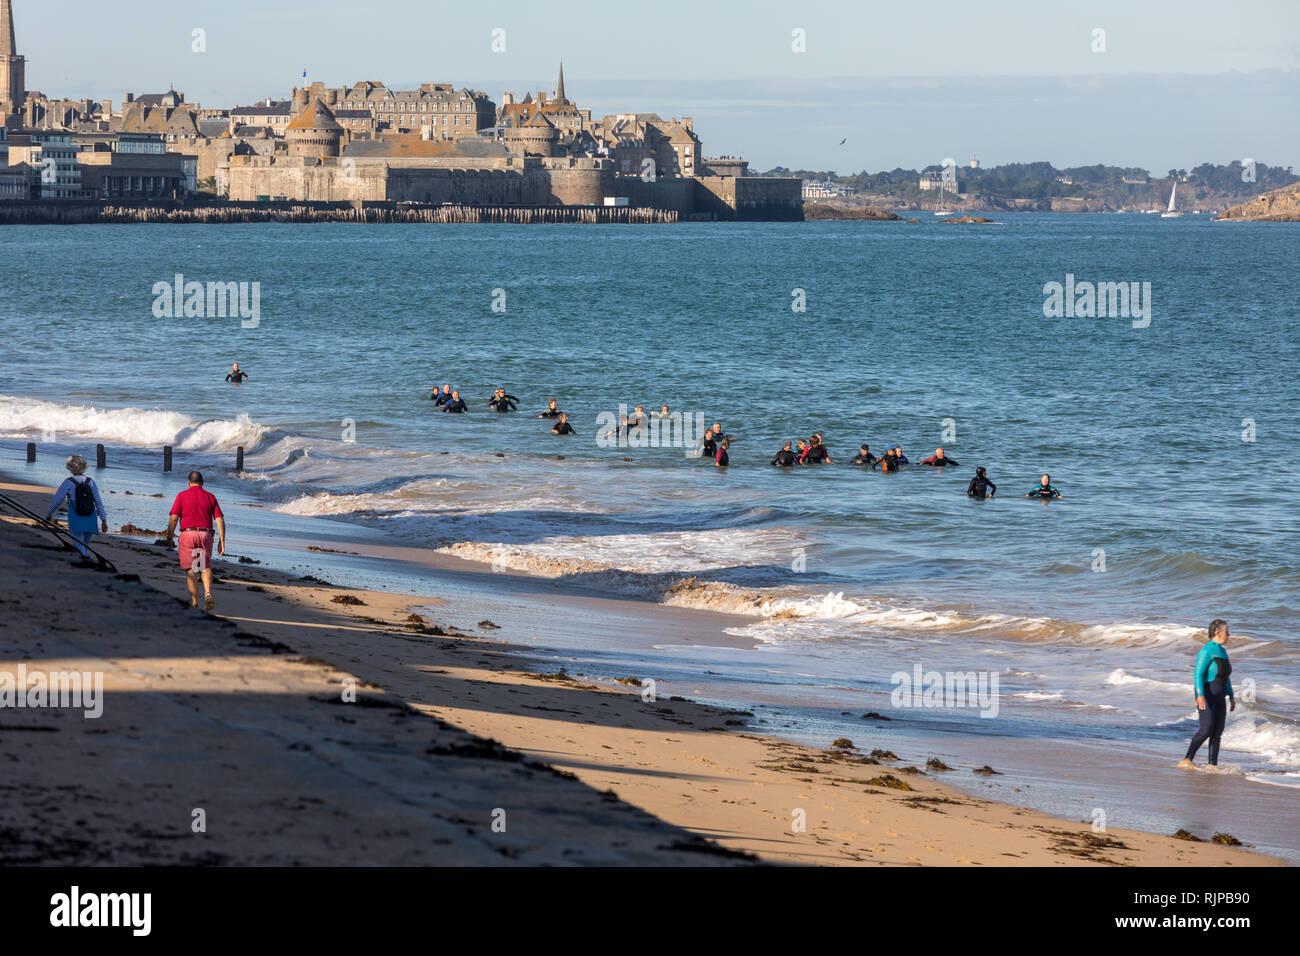 Saint-Malo, France - September 14, 2018: Aqua walking along the beach in Saint-Malo, Brittany, France - Stock Image